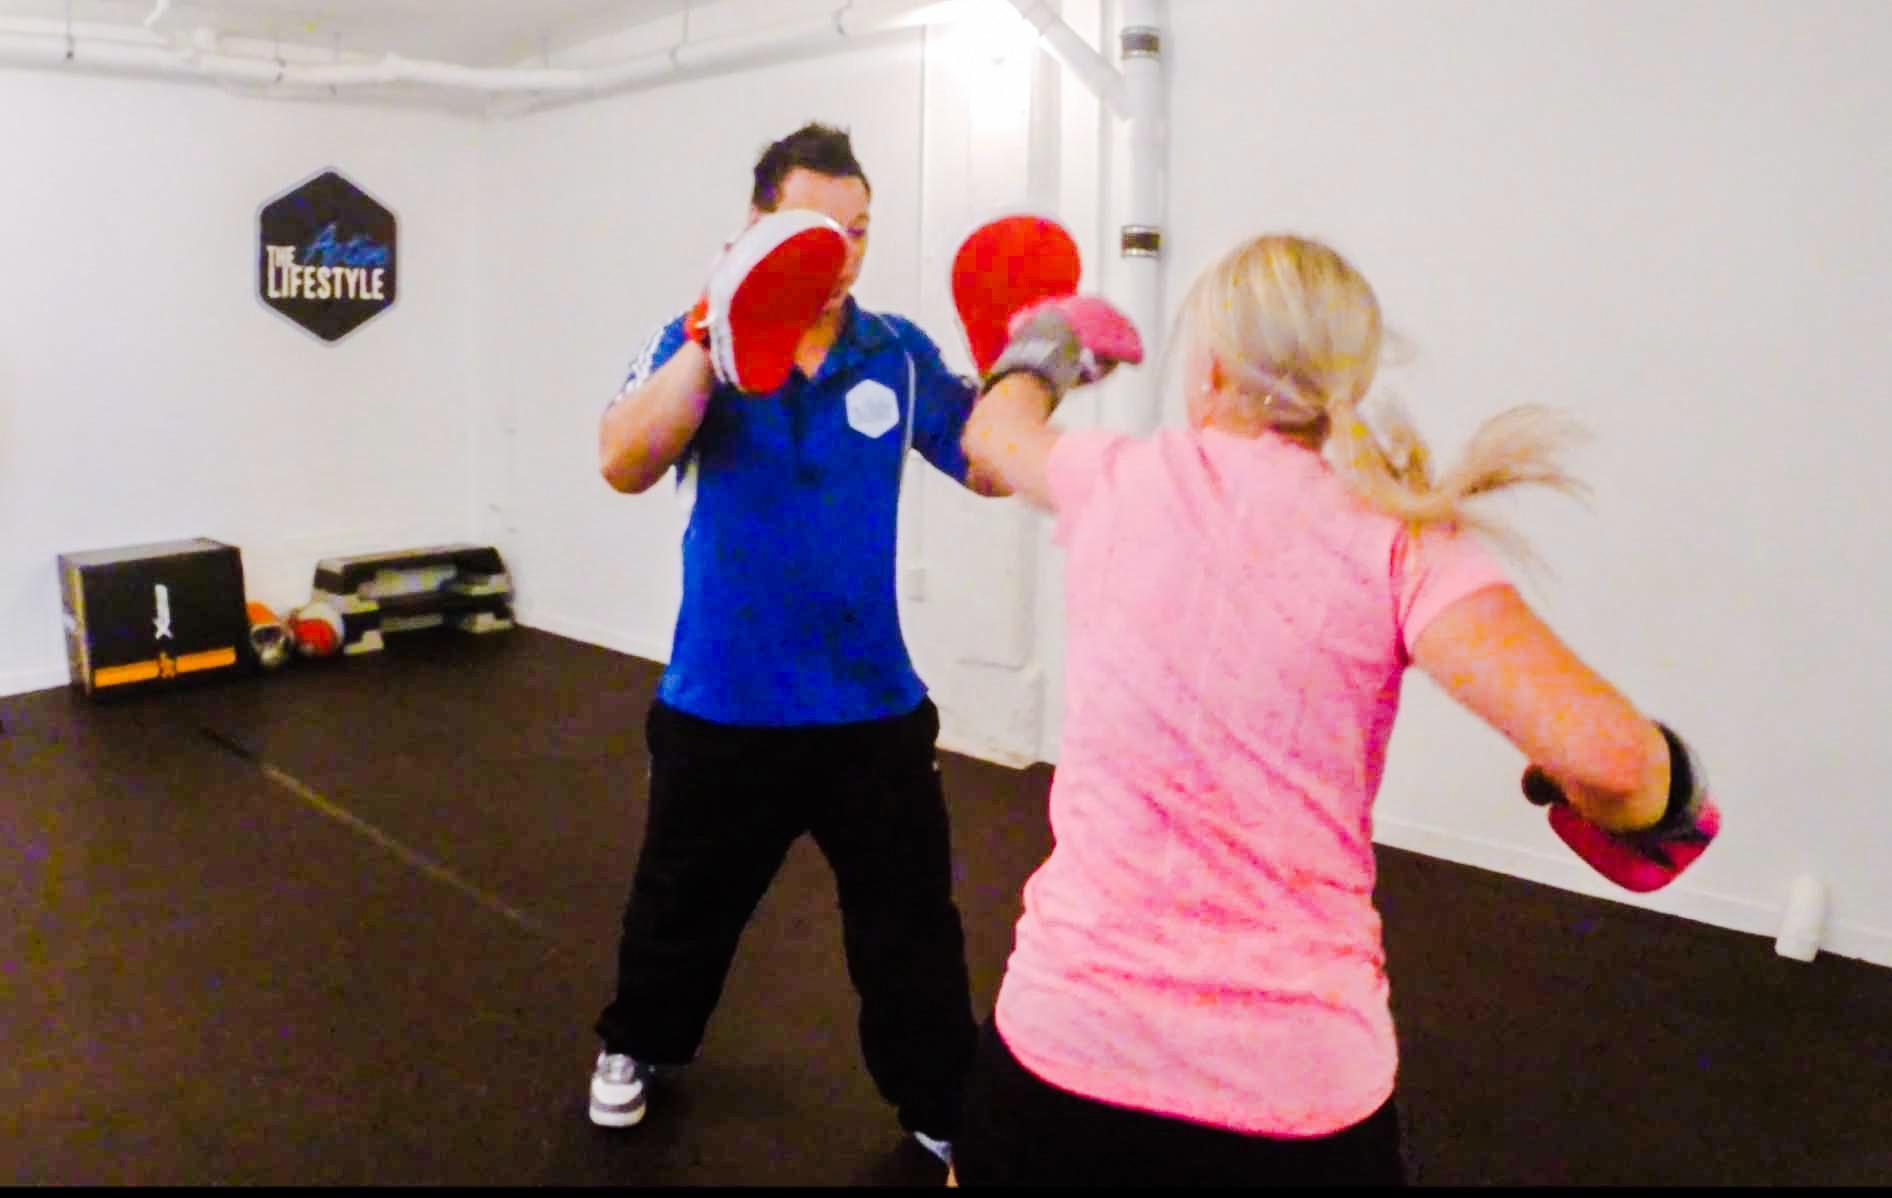 boxing-bron-punch3-small.JPG